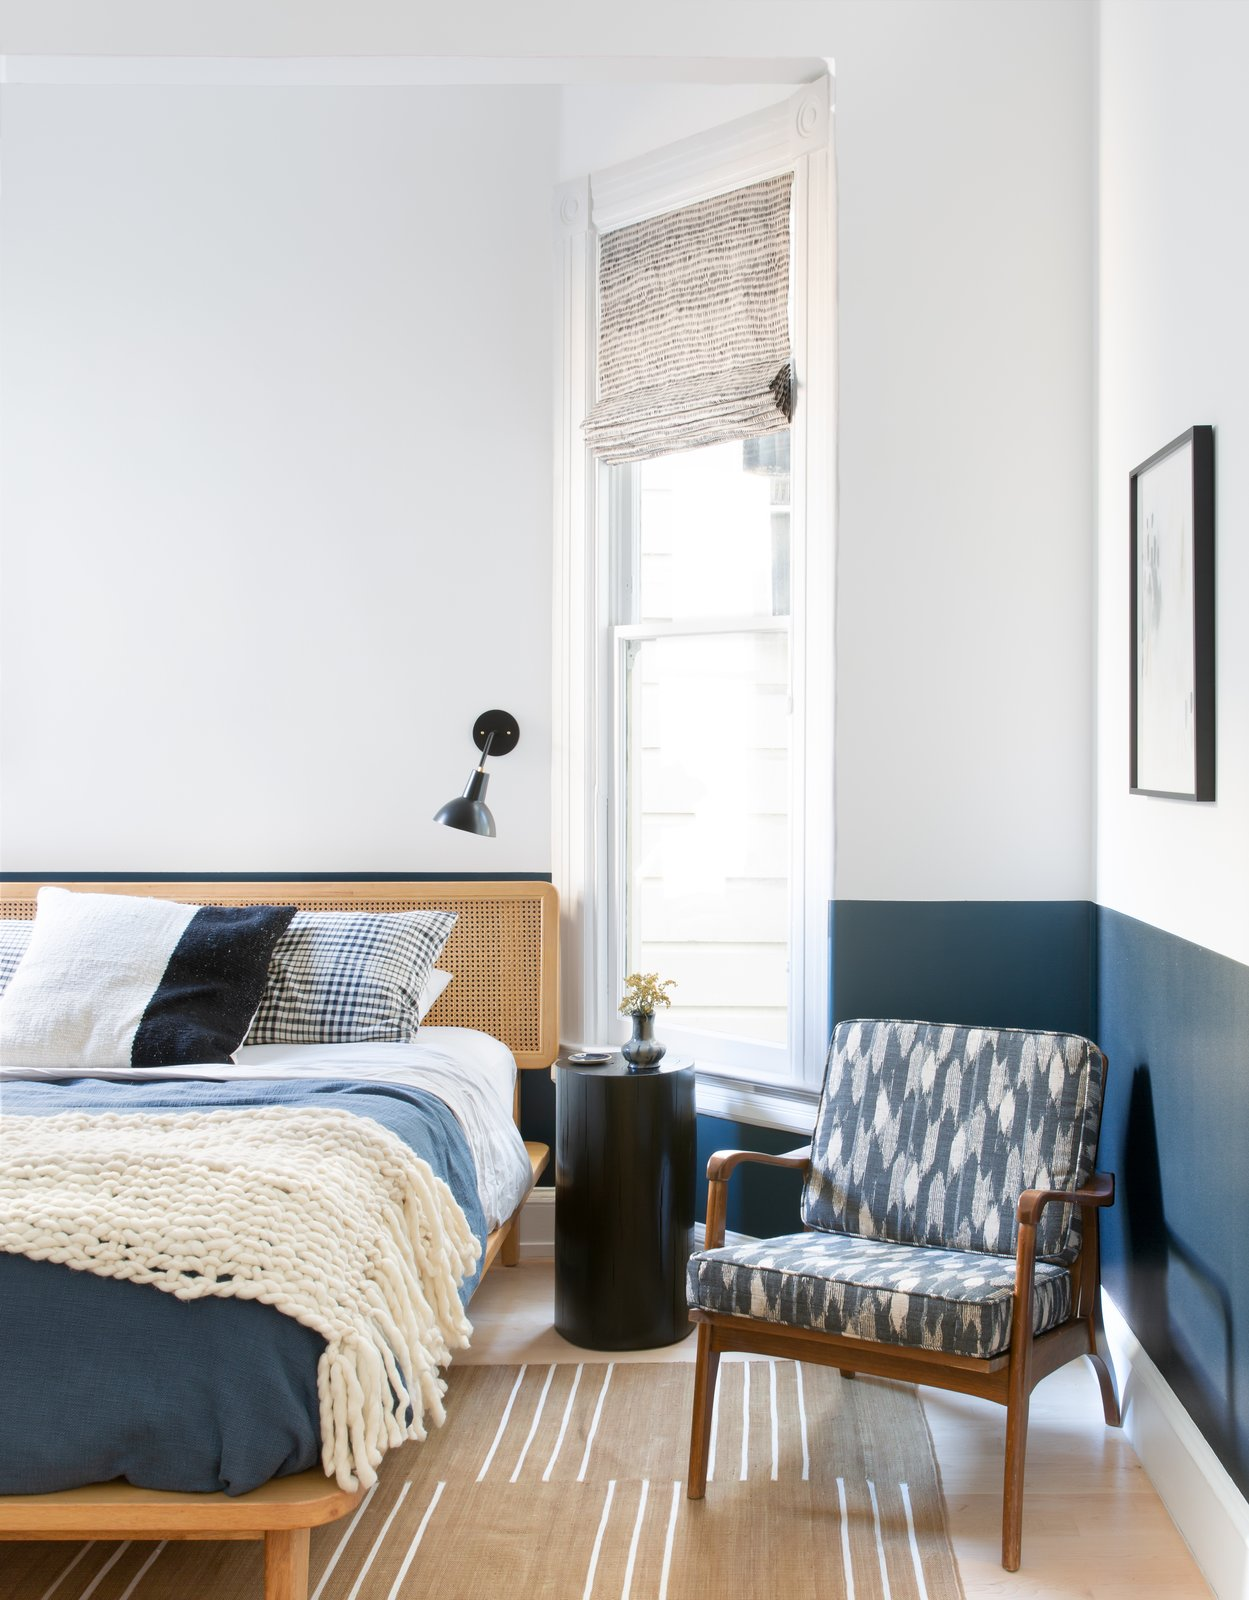 Bedroom, Chair, Wall Lighting, Lamps, Night Stands, Rug Floor, Bed, and Light Hardwood Floor Guest Room  Moody Mission Victorian by Regan Baker Design